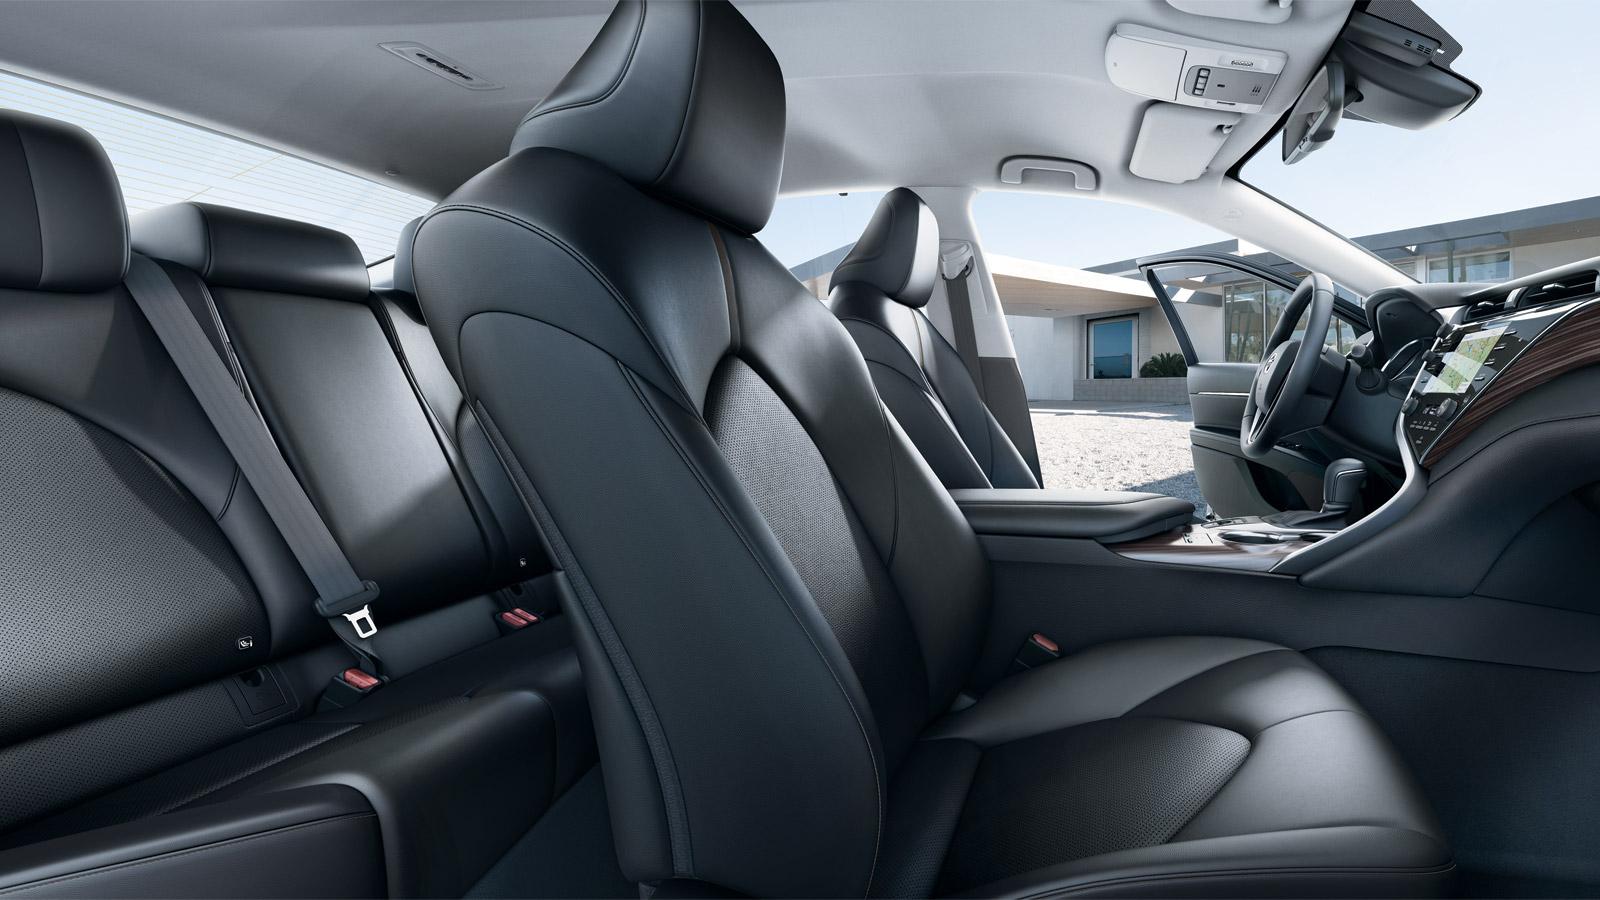 Interior Toyota Camry 2018